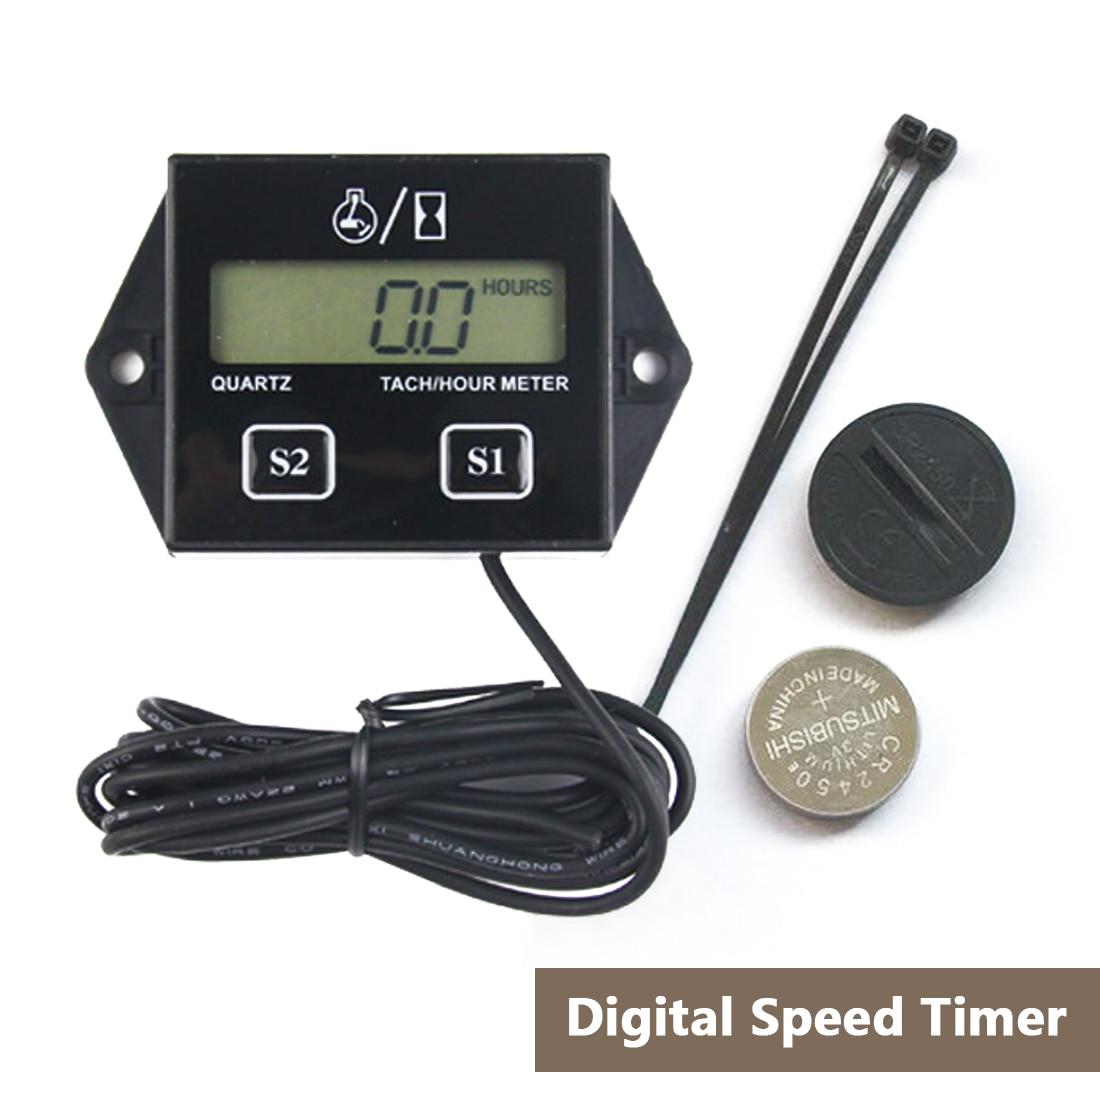 Digitale Motor Tach Stunde Meter Tachometer-lehre Induktive Display Für Motorrad Motor Marine Kettensäge Pit Bike Boot